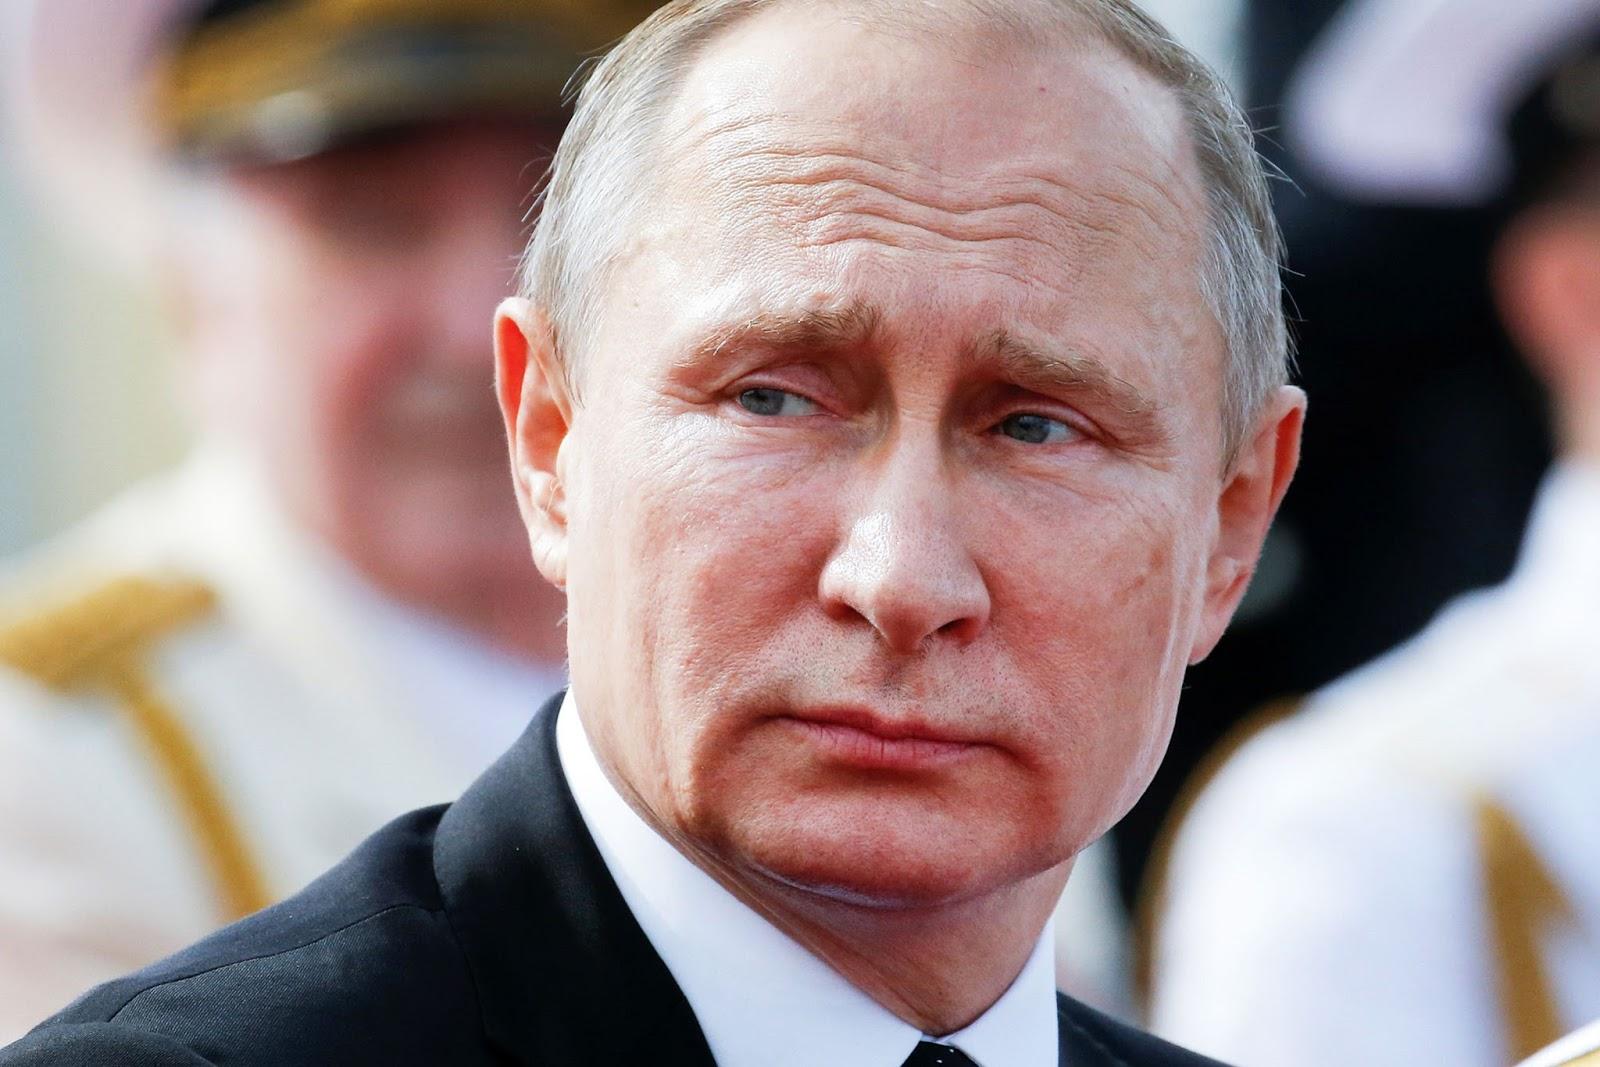 RUSSIA WINTER OLYMPICS 2